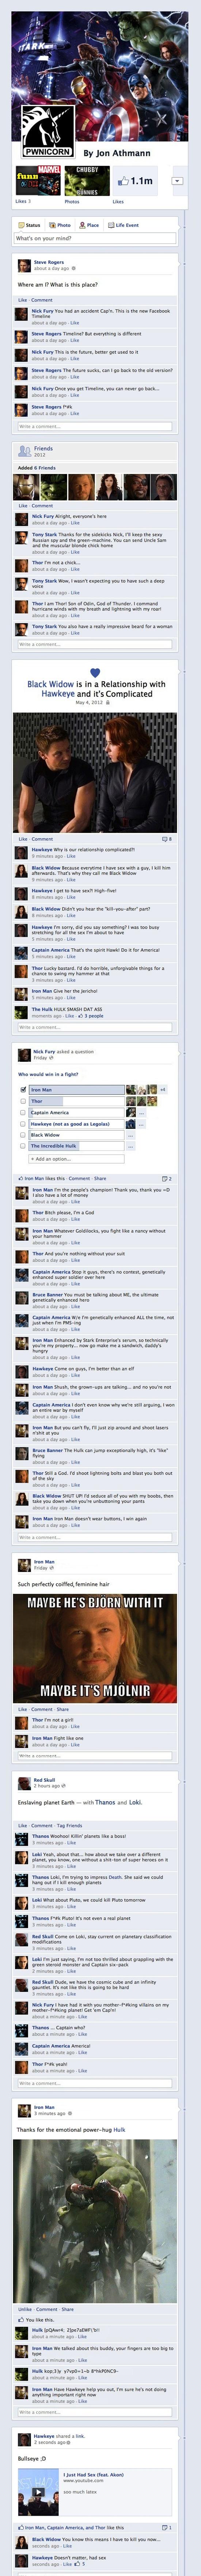 Dude. Epic.Nerd, Facebook, Iron Man, Too Funny, Hulk Smash, Theavengers, So Funny, Avengers Assembly, The Avengers